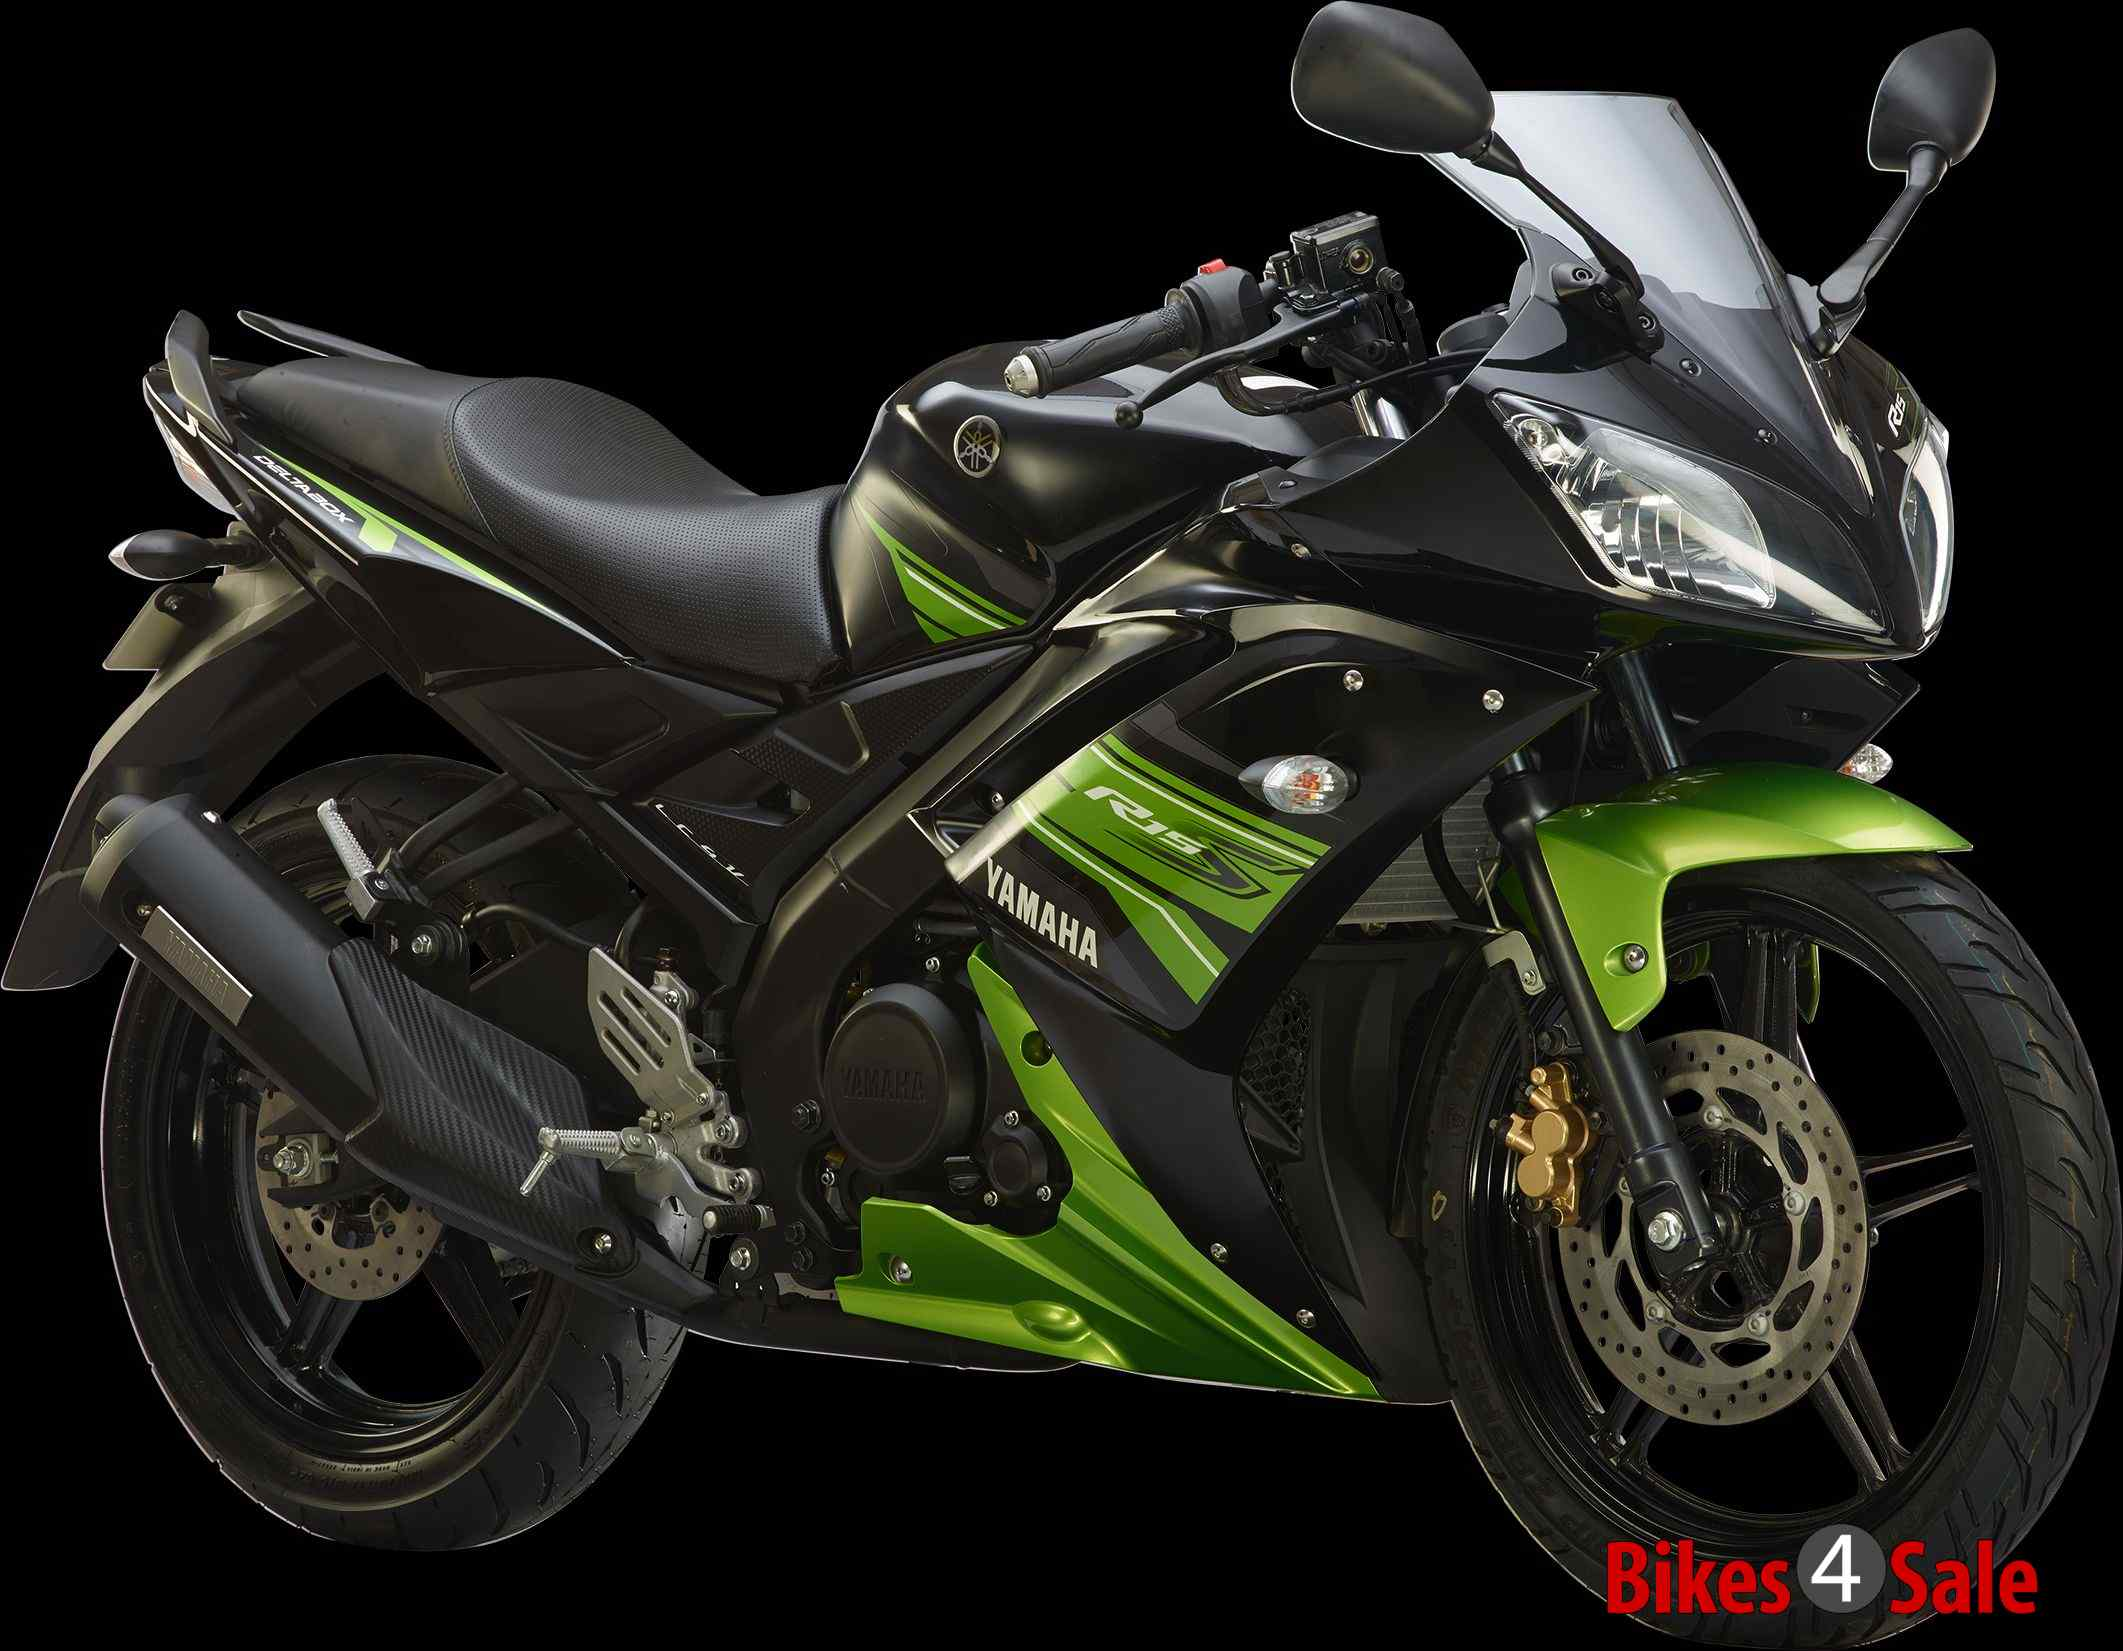 Blue Book On Yamaha Motorcycles